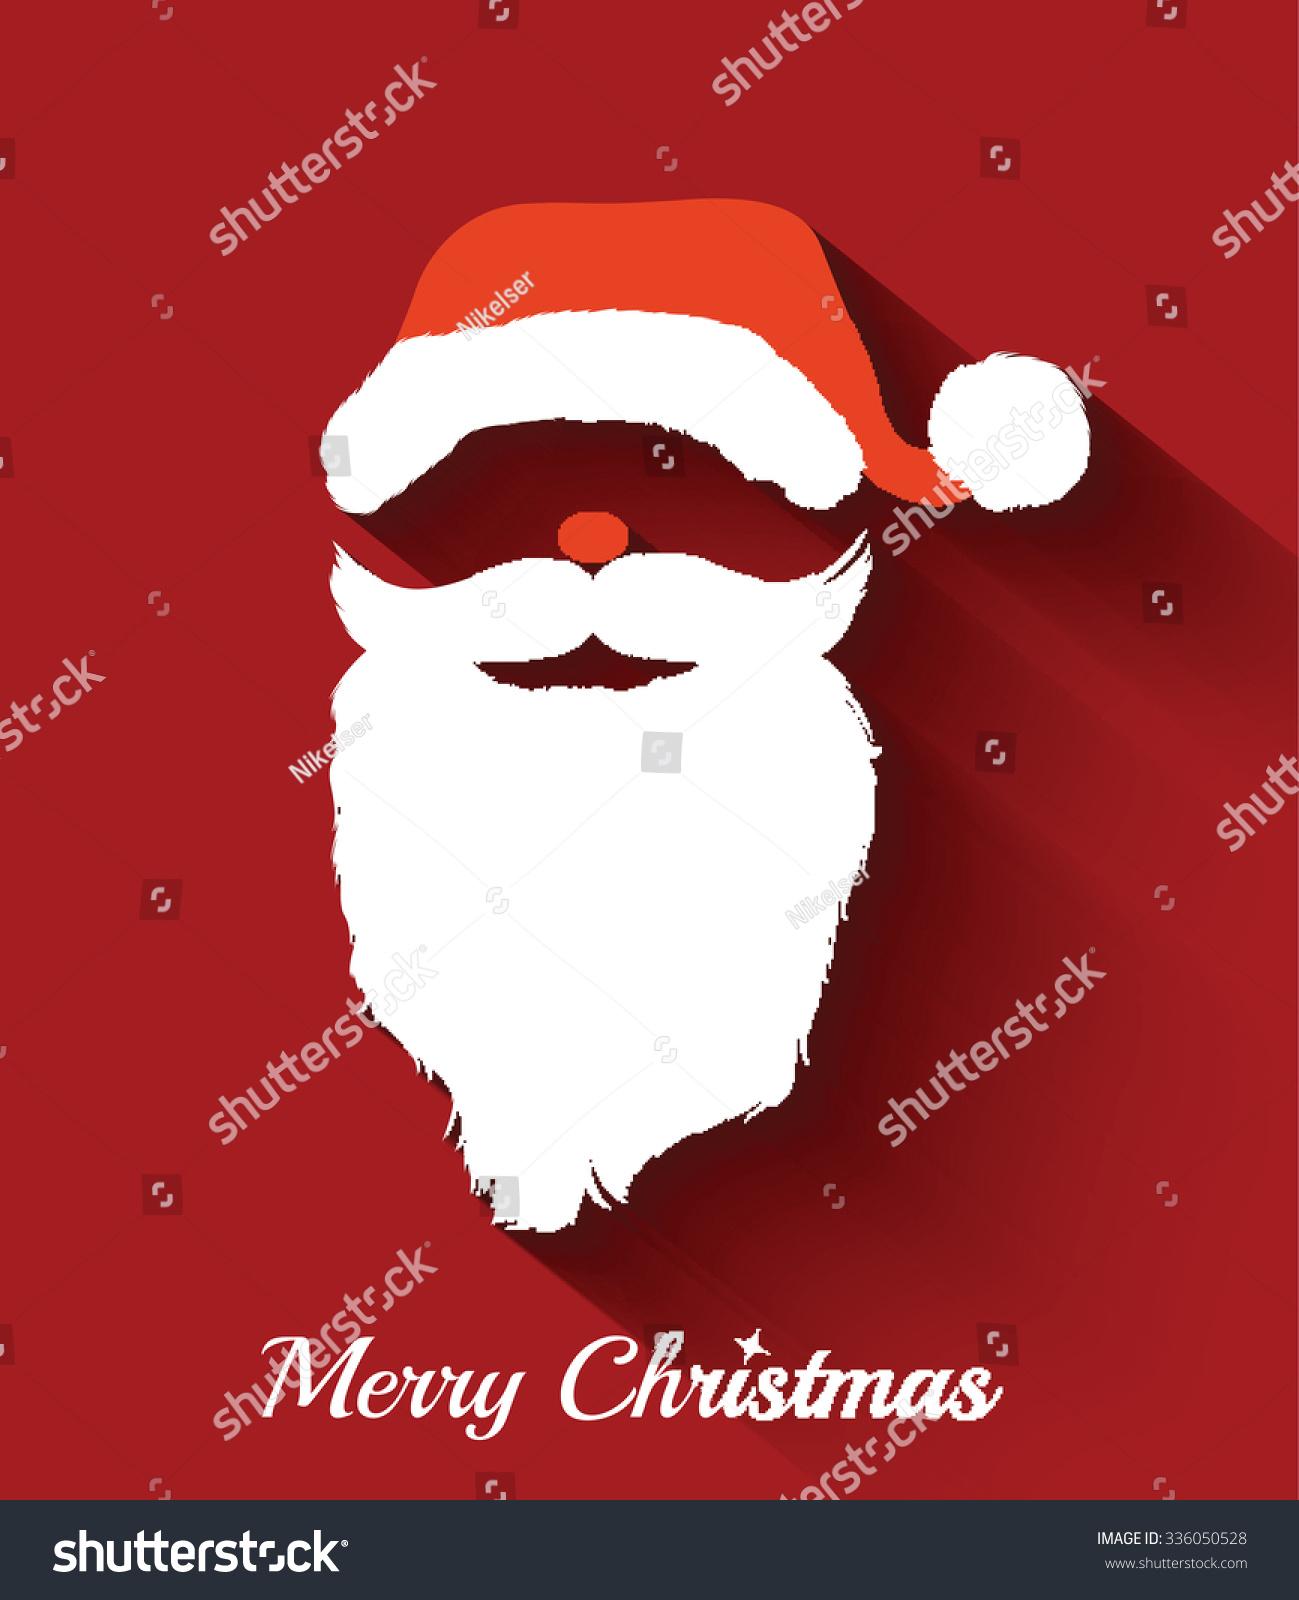 Santa Claus hat and beard template .Christmas Retro Santa Card - in ...